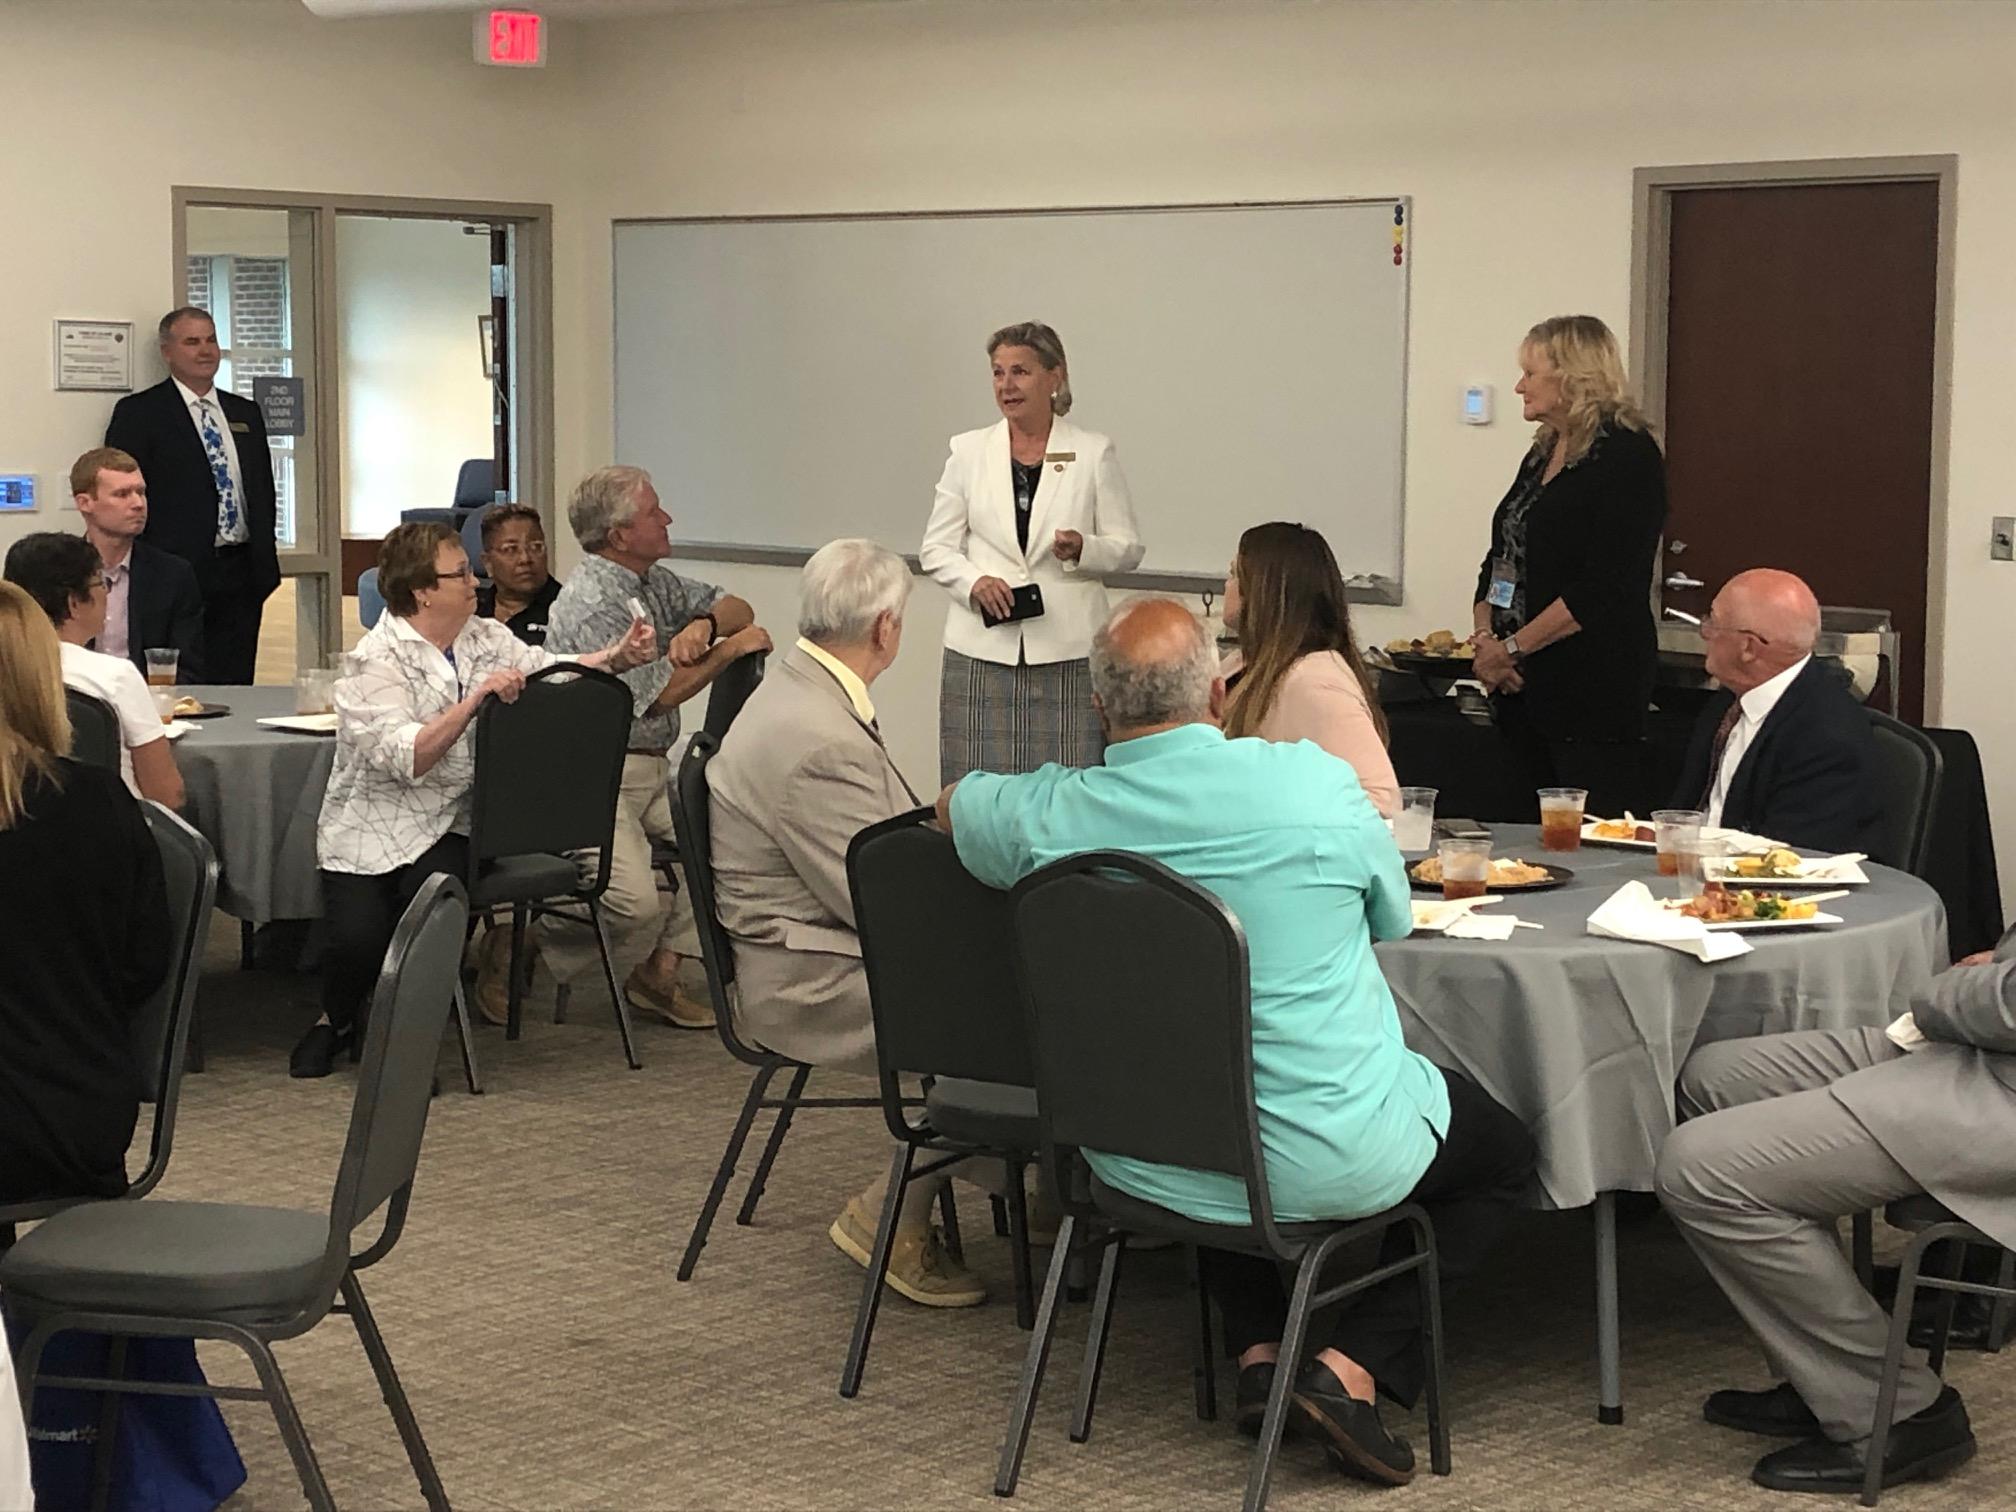 N.C. Representative Deb Butler and Leland Mayor Brenda Bozeman speaking to volunteers during a reception